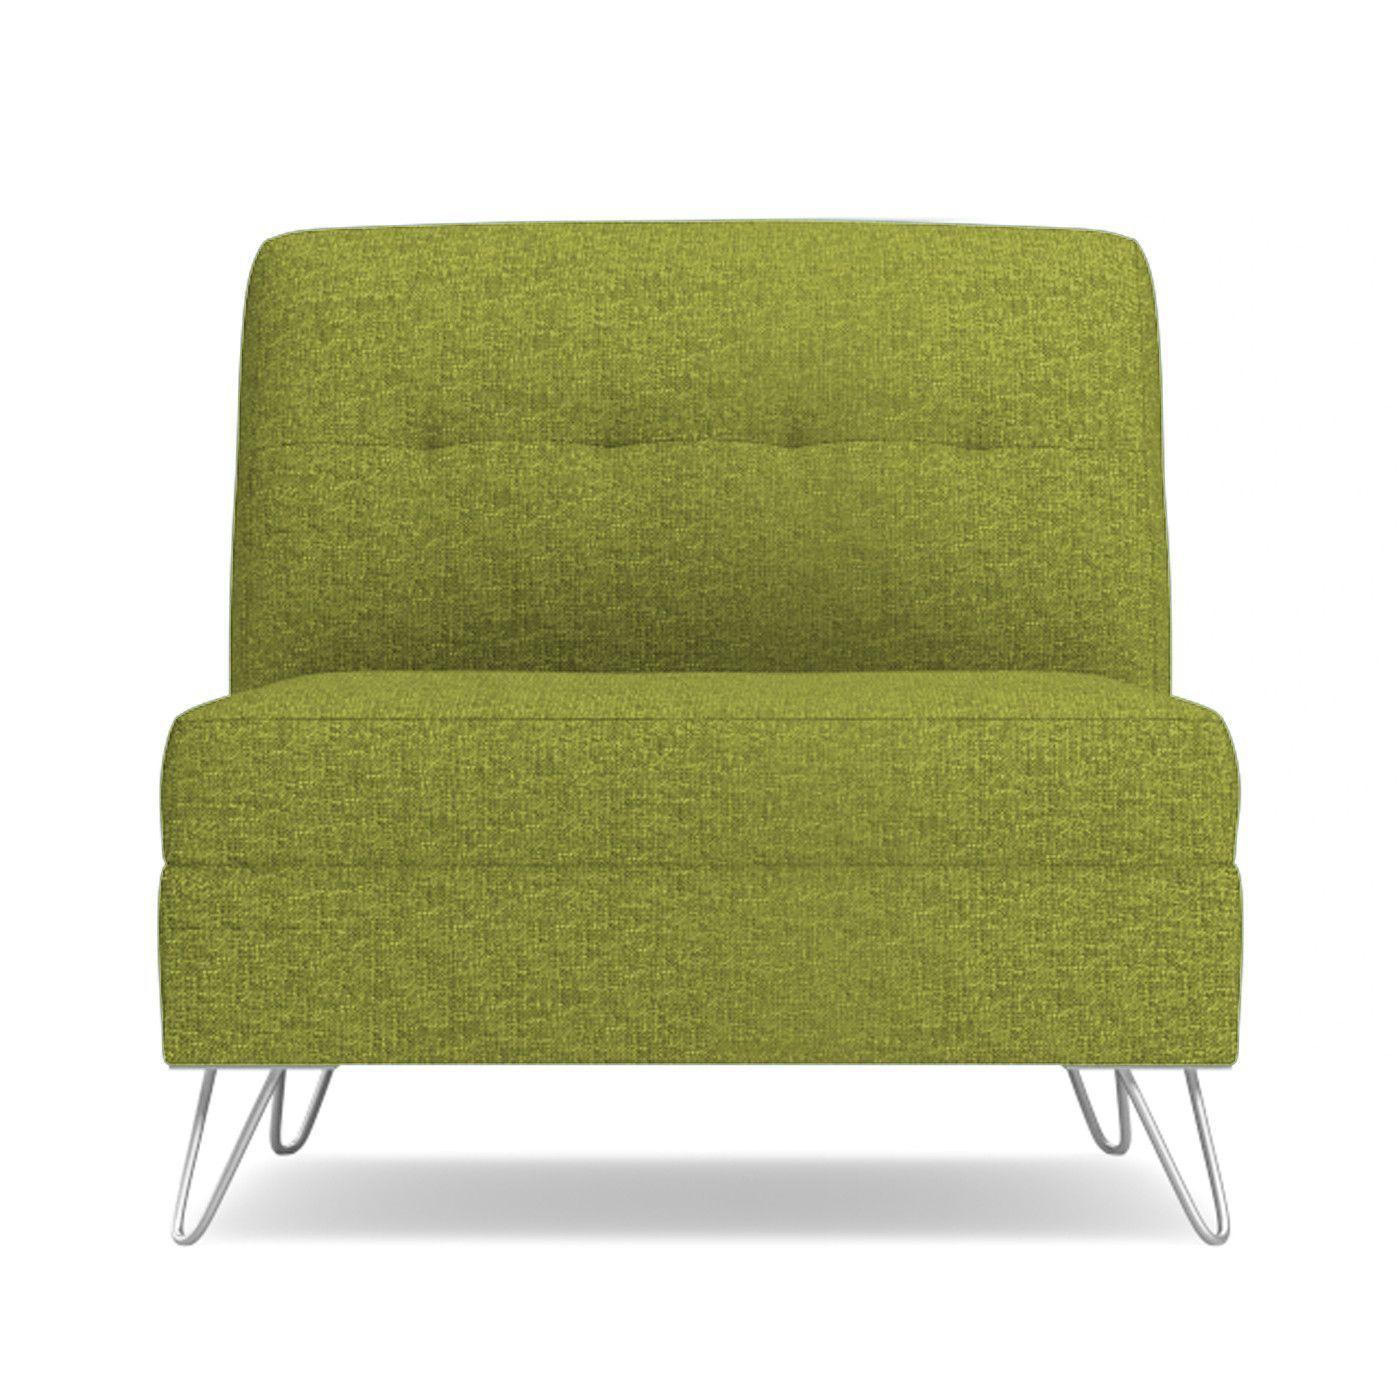 Vine Eco-Friendly Chair CHOICE OF FABRICS